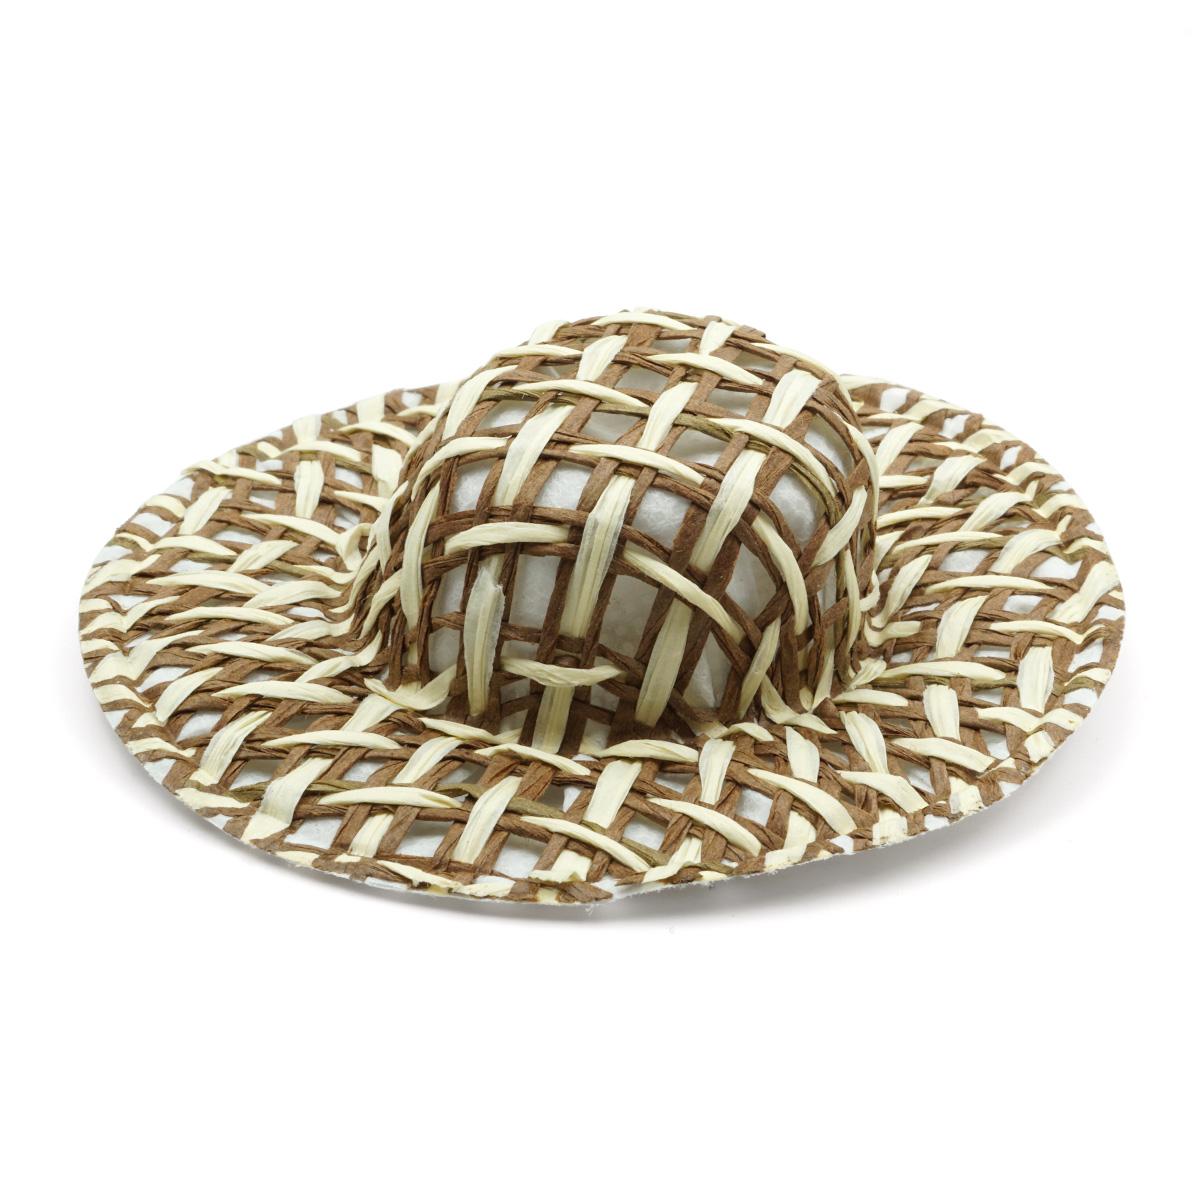 Шляпа коричневая 8,5 см, 2 шт/упак